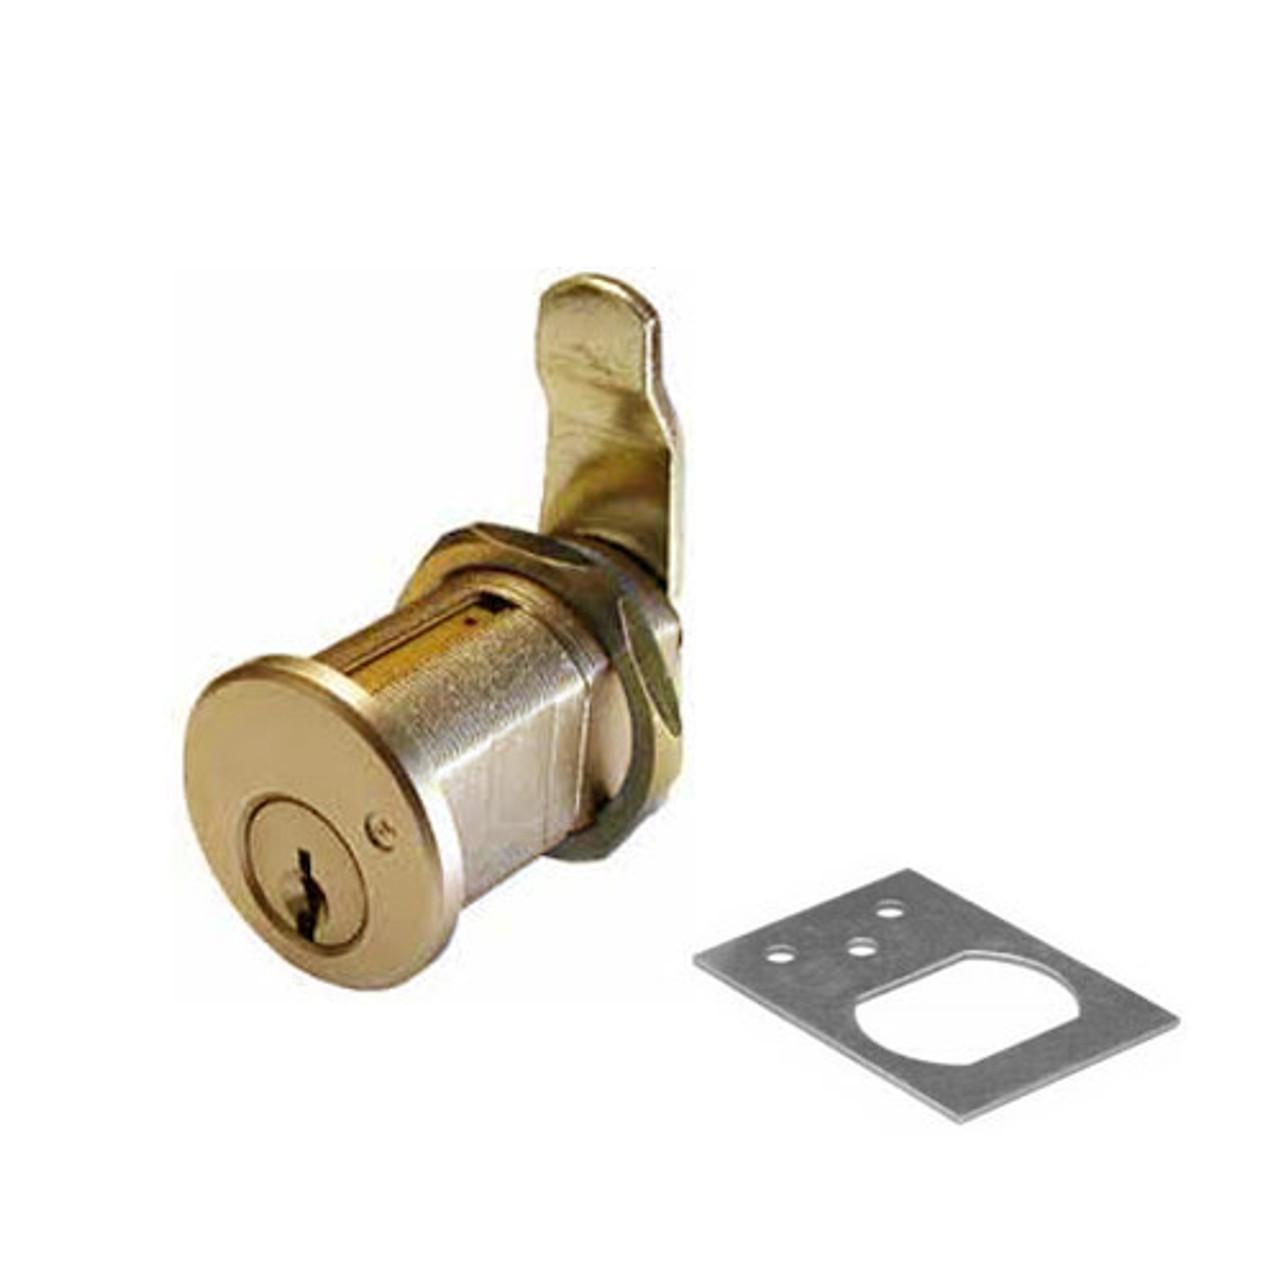 Olympus 820S-KD-US3 Cam Locks in Bright Brass Finish